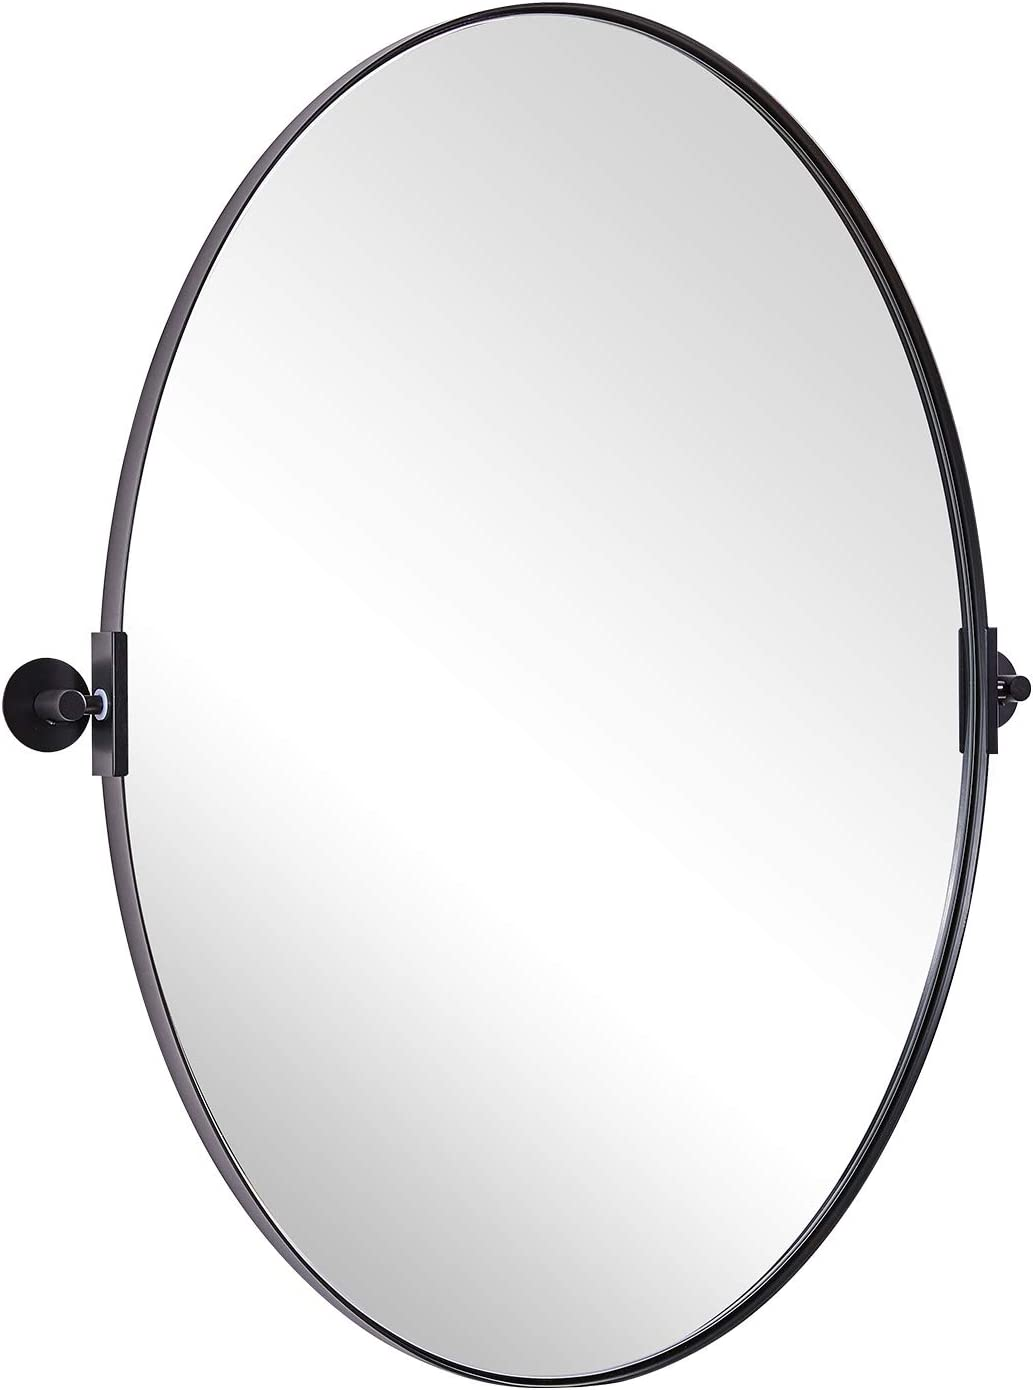 Buy Moon Mirror Oval Vanity Mirror 20x28 Black Oval Pivot Mirror For Bathroom In Stainless Steel Frame 1 Deep Set Design Wall Mounted Mirror Hangs Vertical Online In Turkey B08tzw92h9